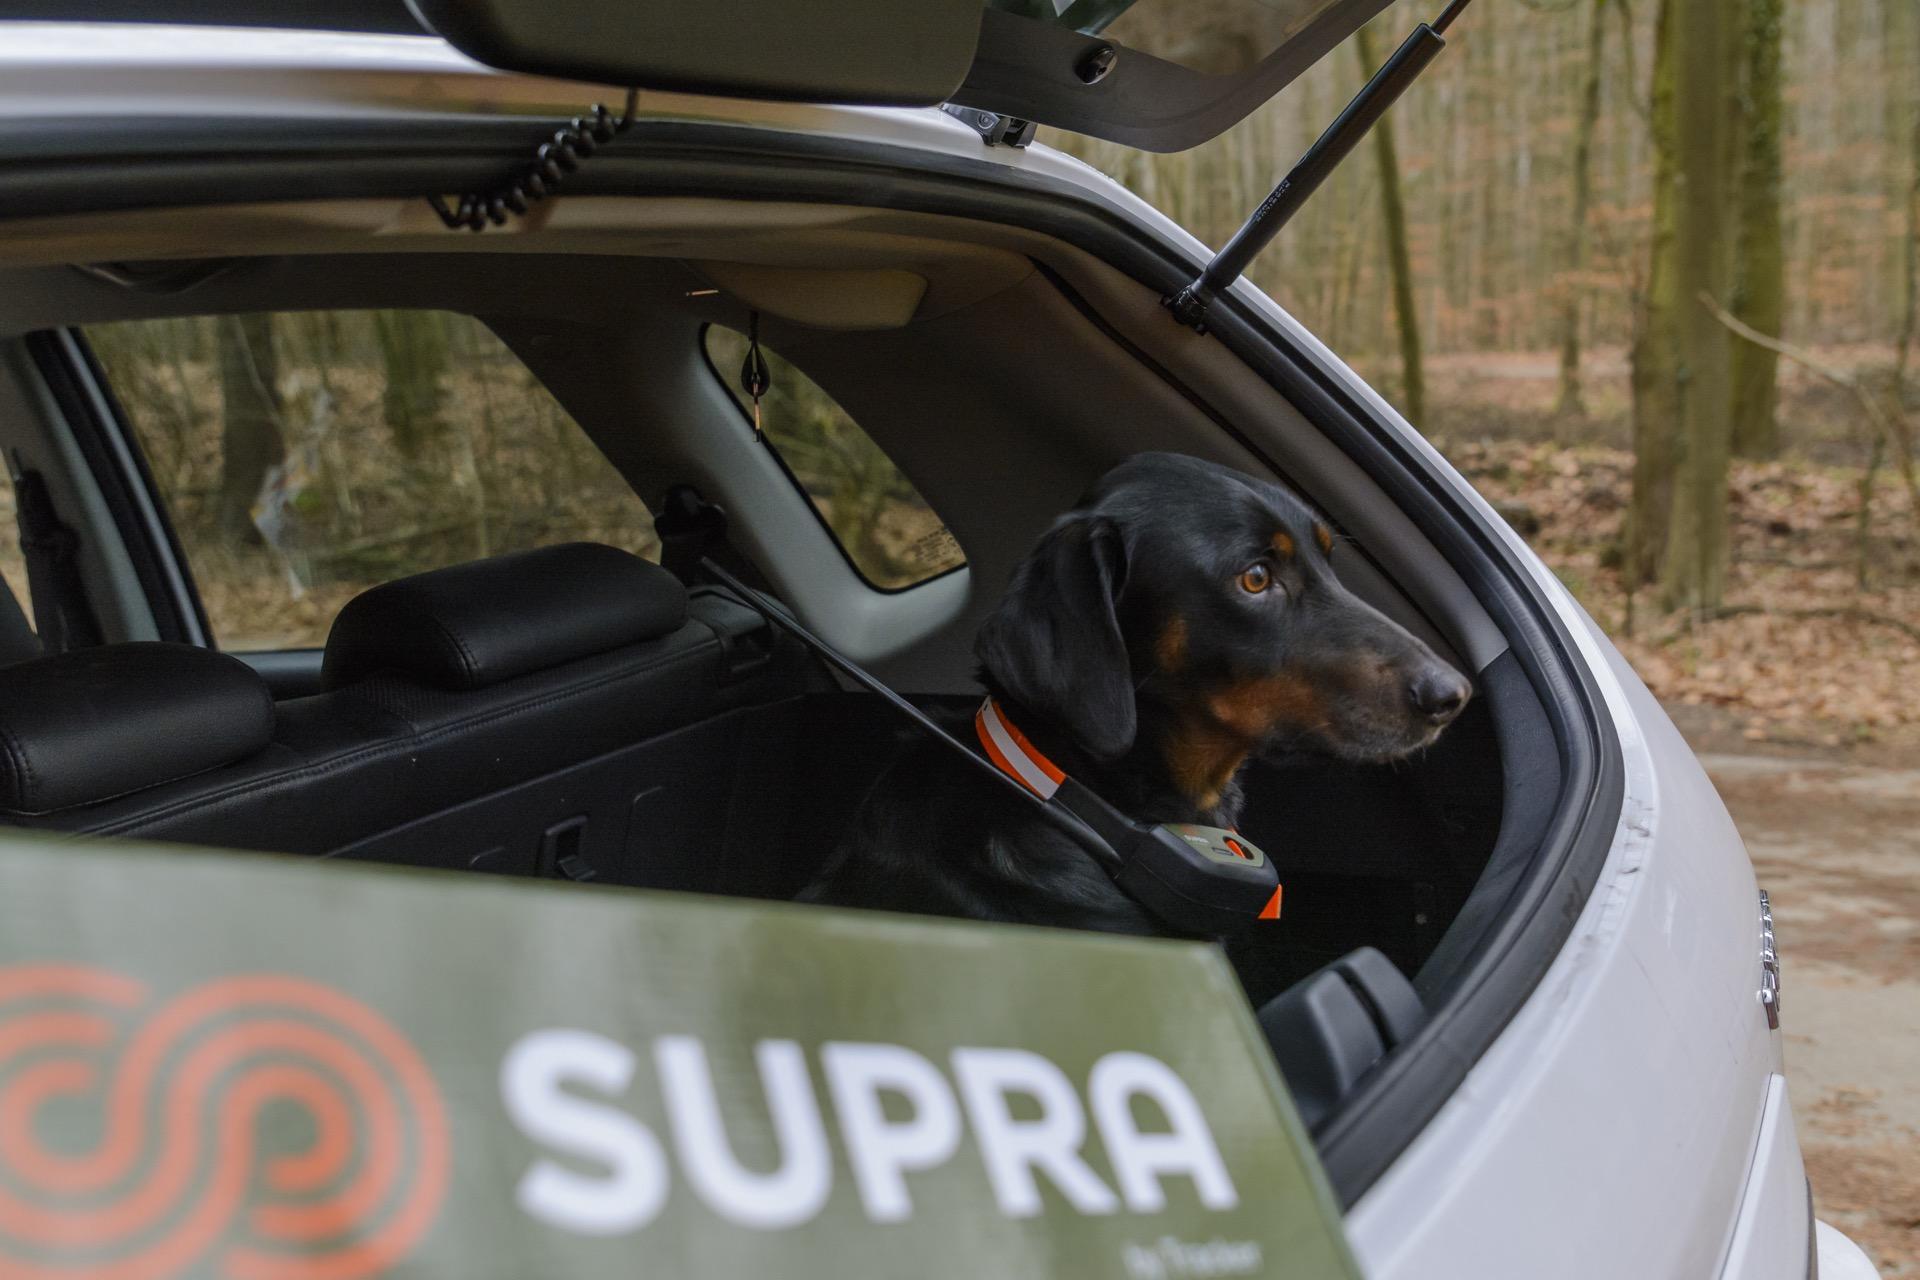 GPS Hundeortung - Der Tracker Supra im Praxistest